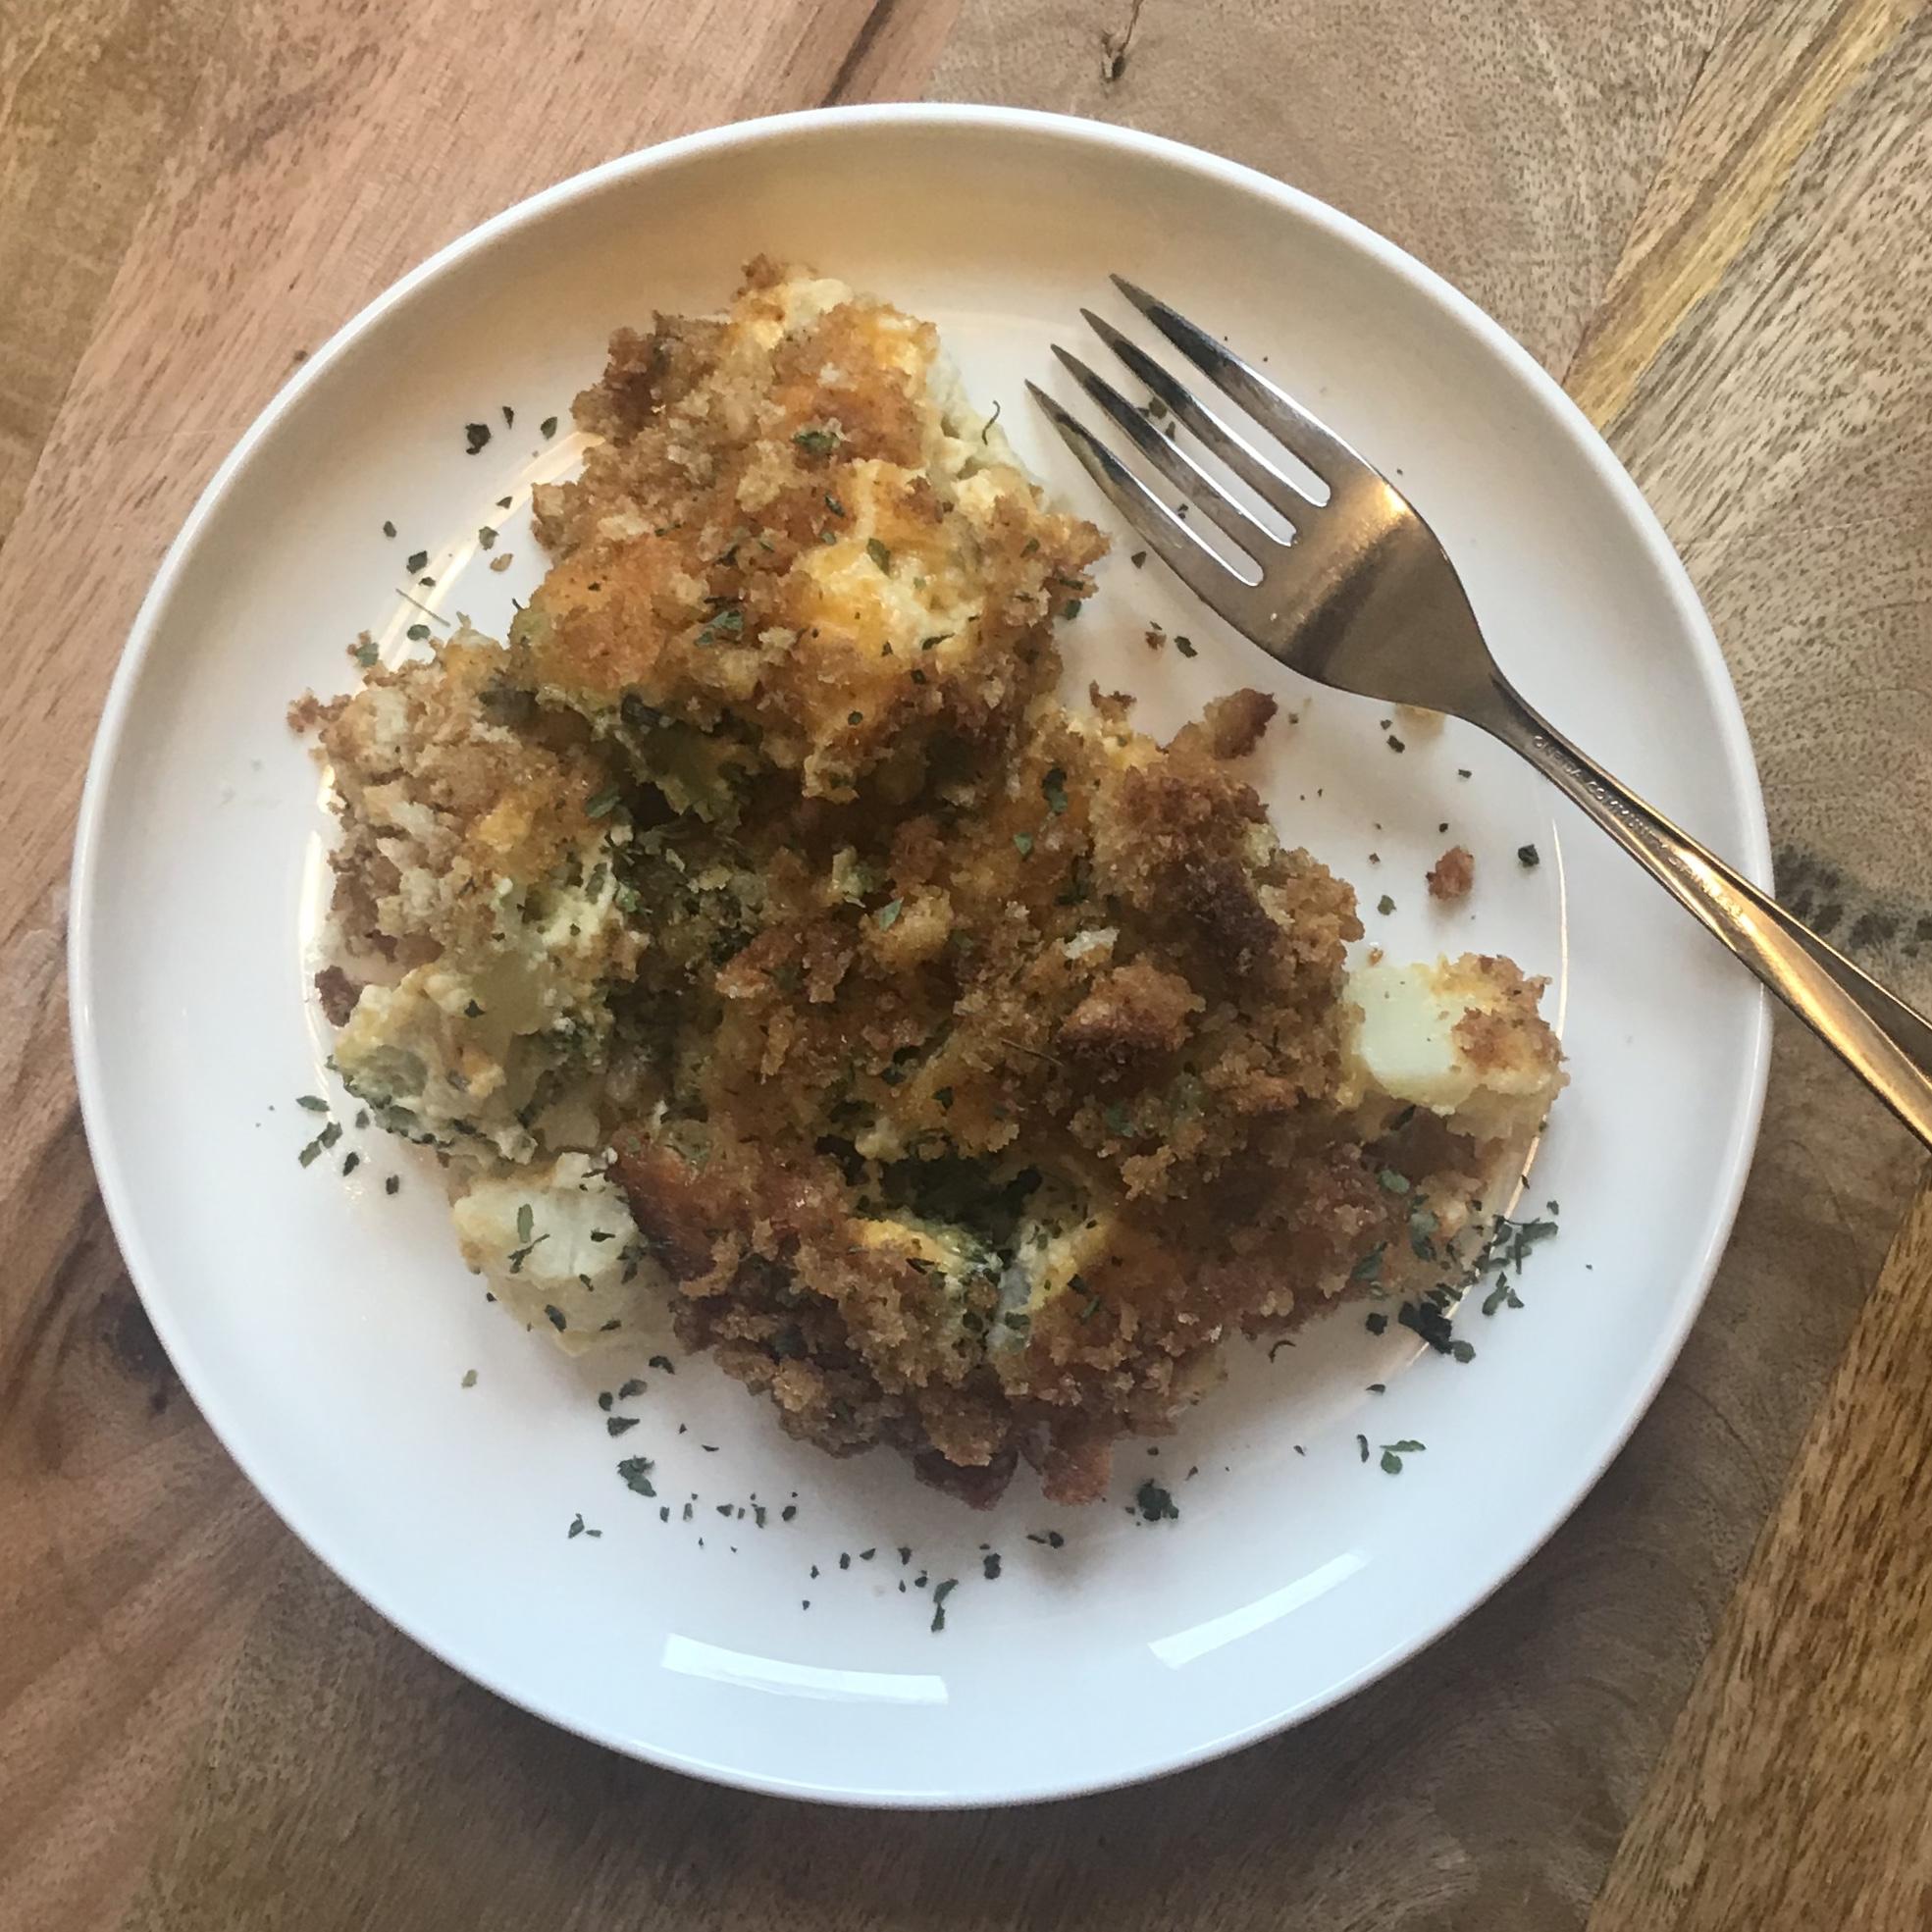 Broccoli and Cauliflower Bake MommaBean3